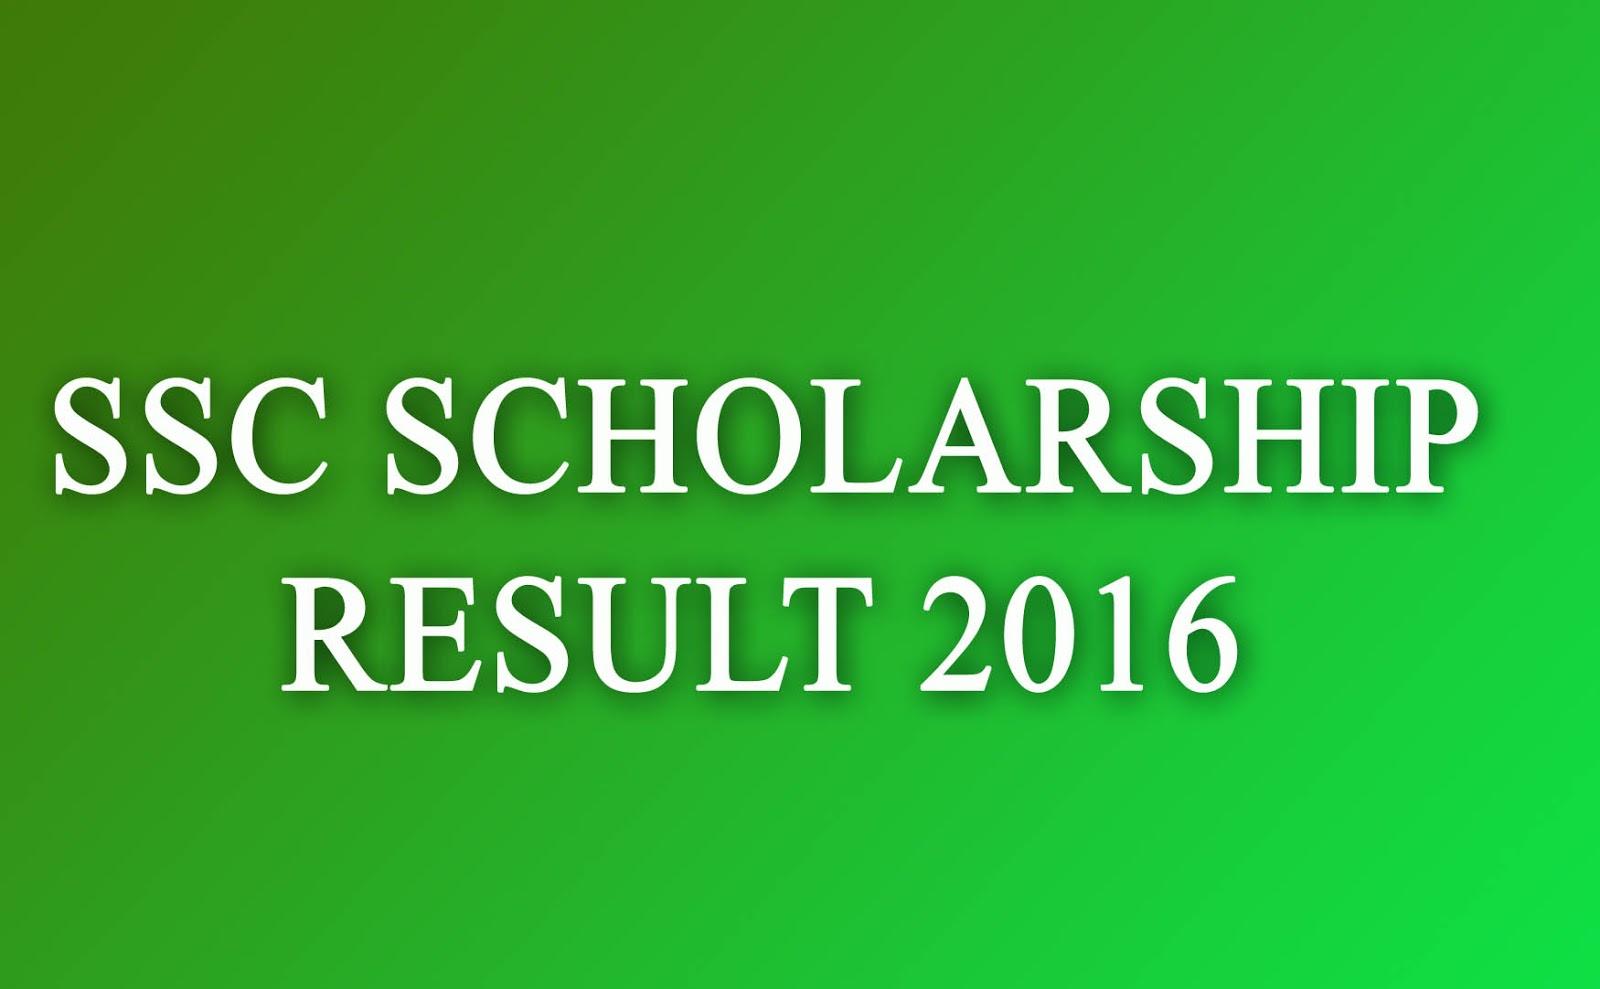 ssc scholarship result 2016 all education board latest bangladeshi